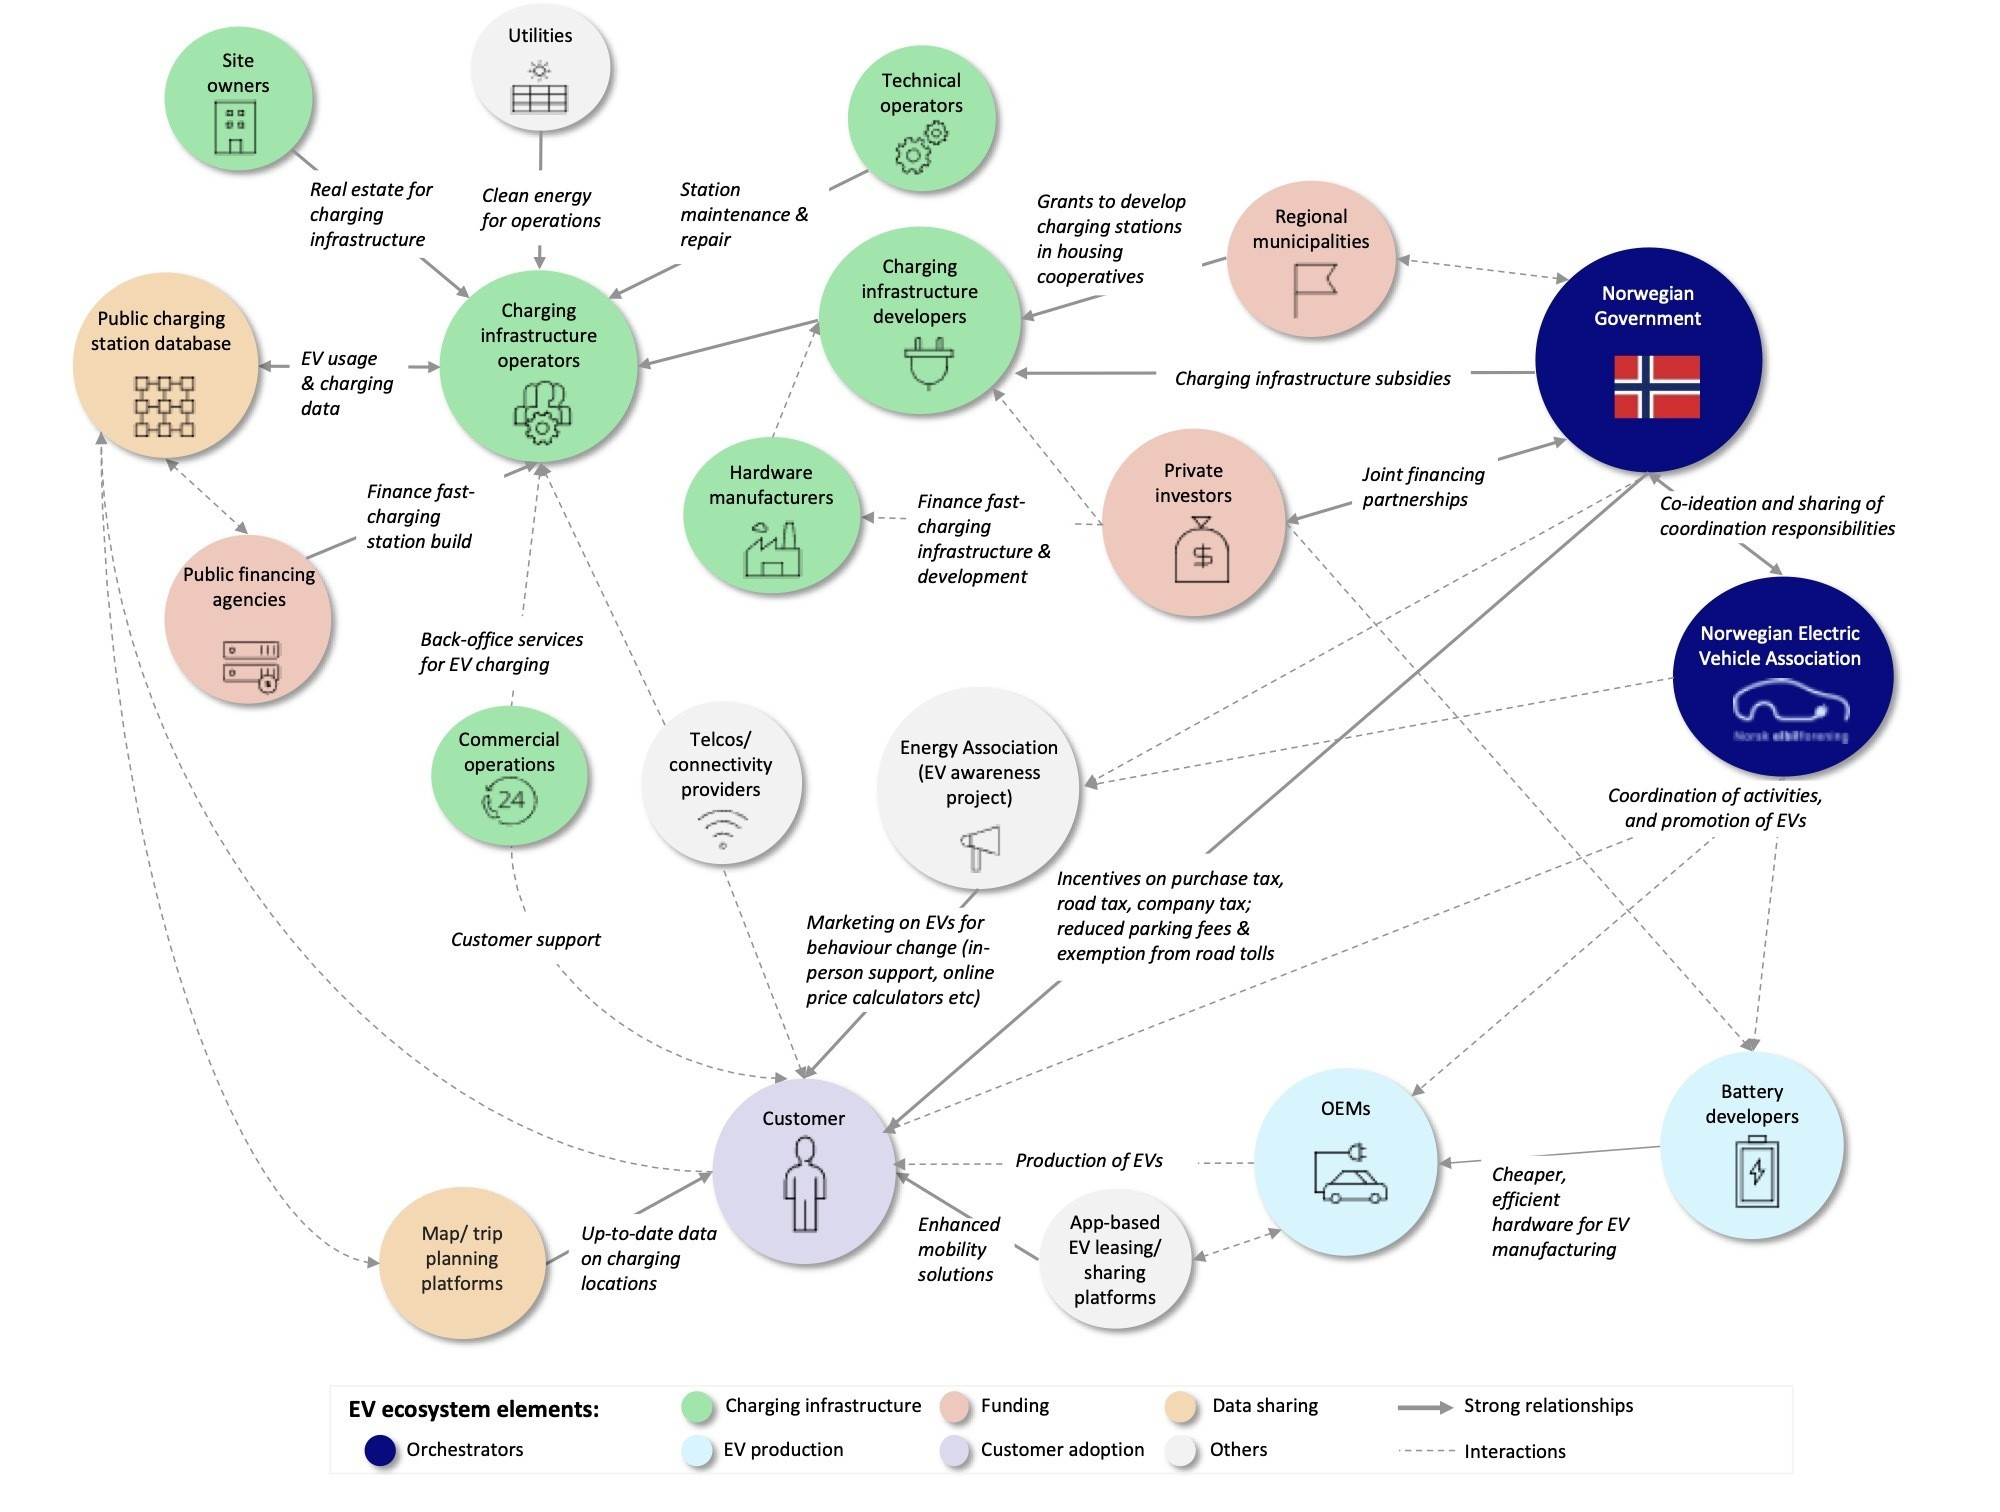 Figure 1. Norwegian EV ecosystem key collaborators and contributions.